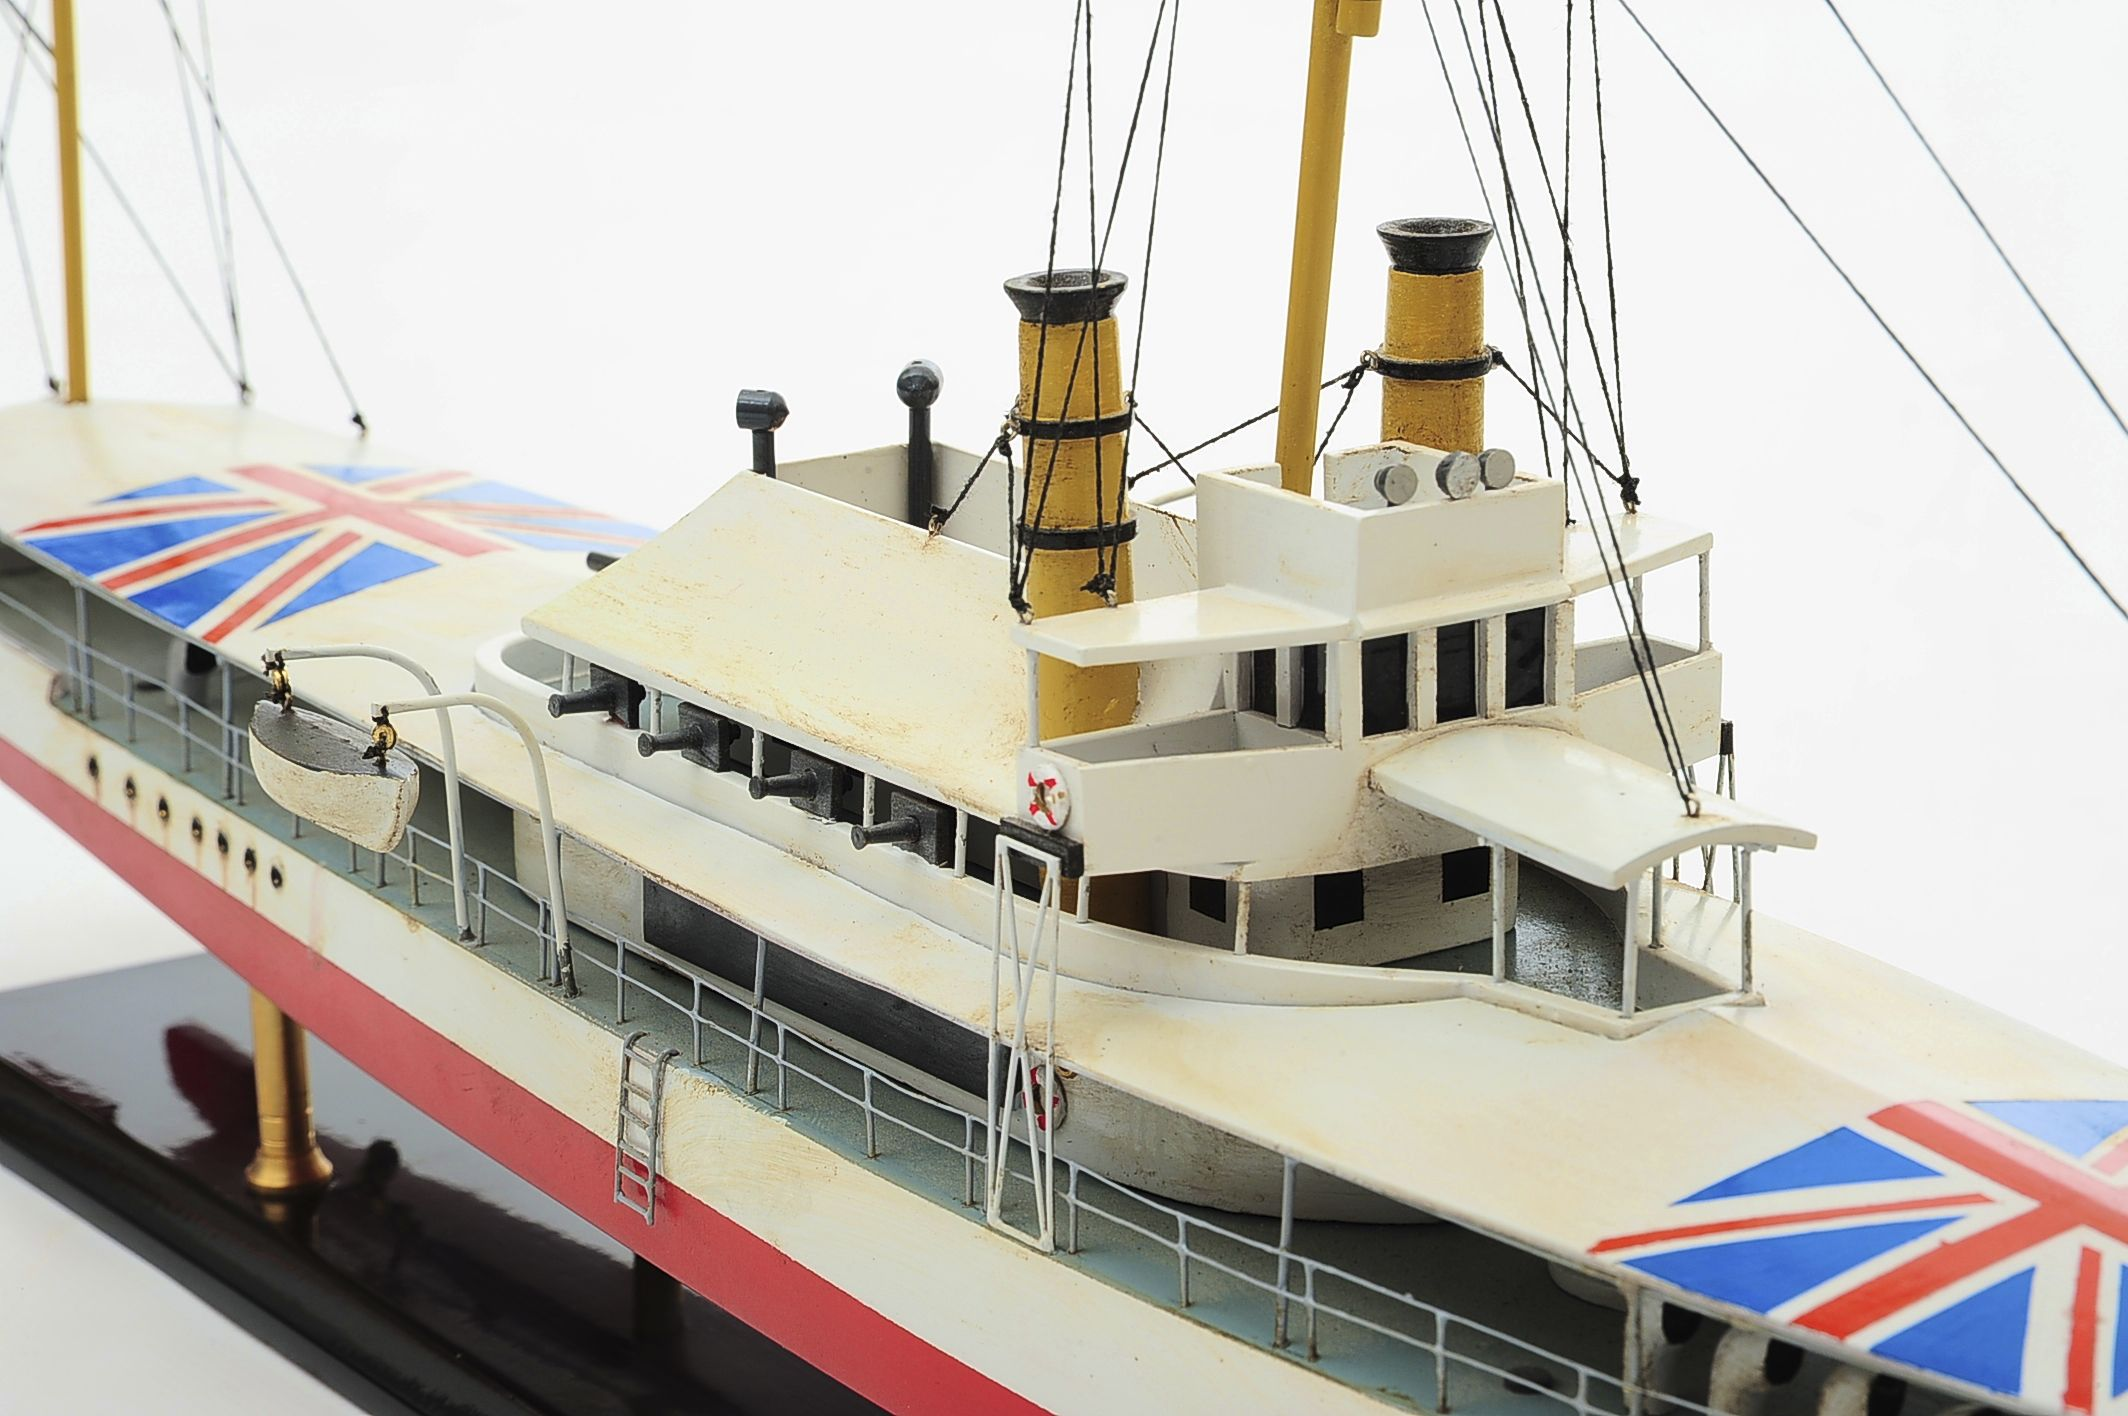 1392-6176-HMS-Cockchafer-Premier-Range